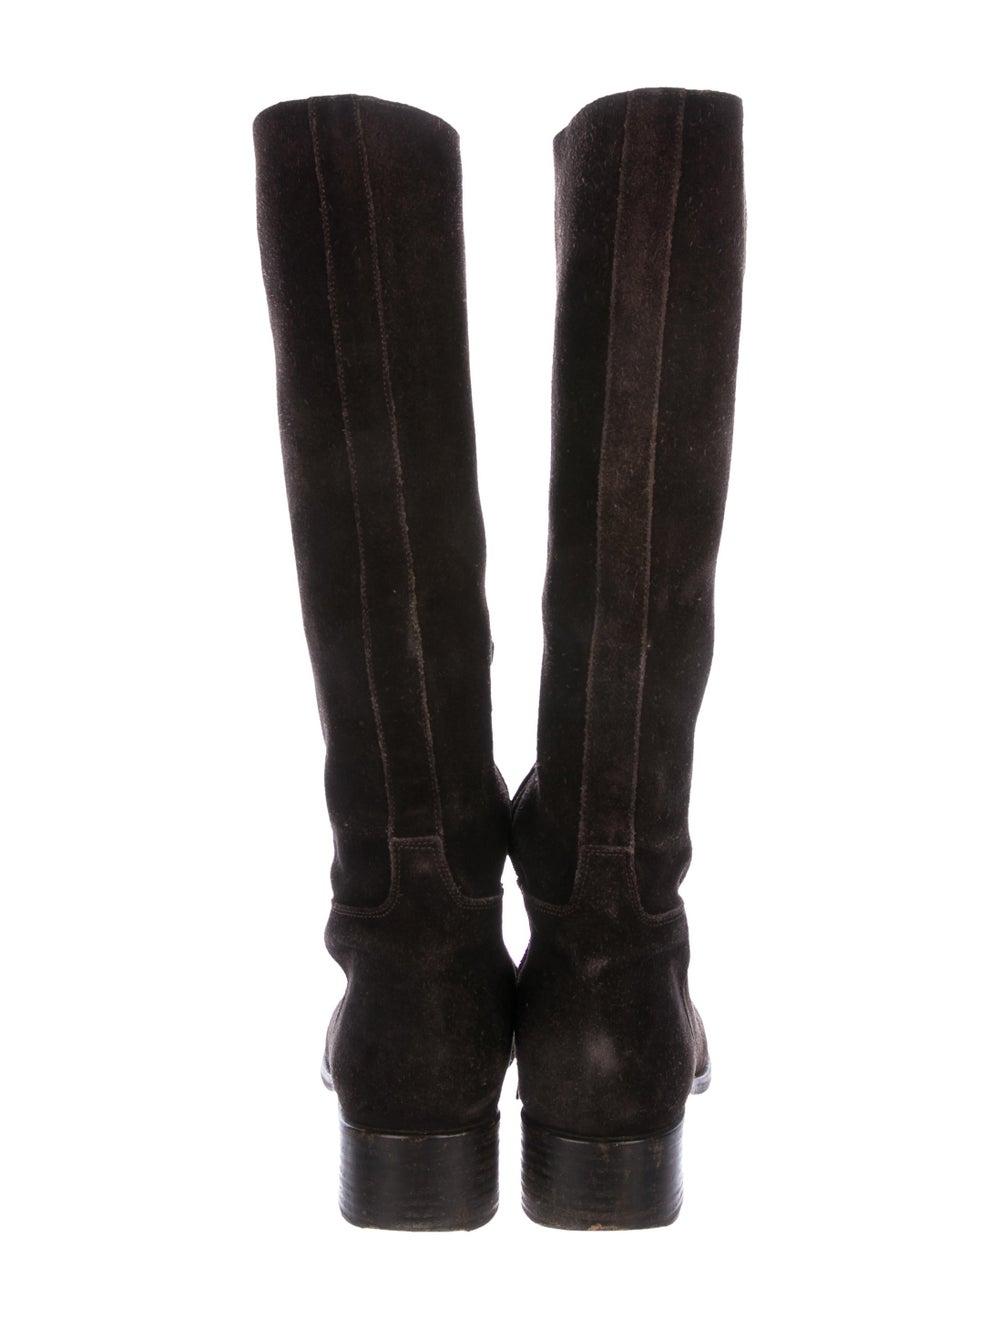 Prada Suede Knee-High Boots - image 4